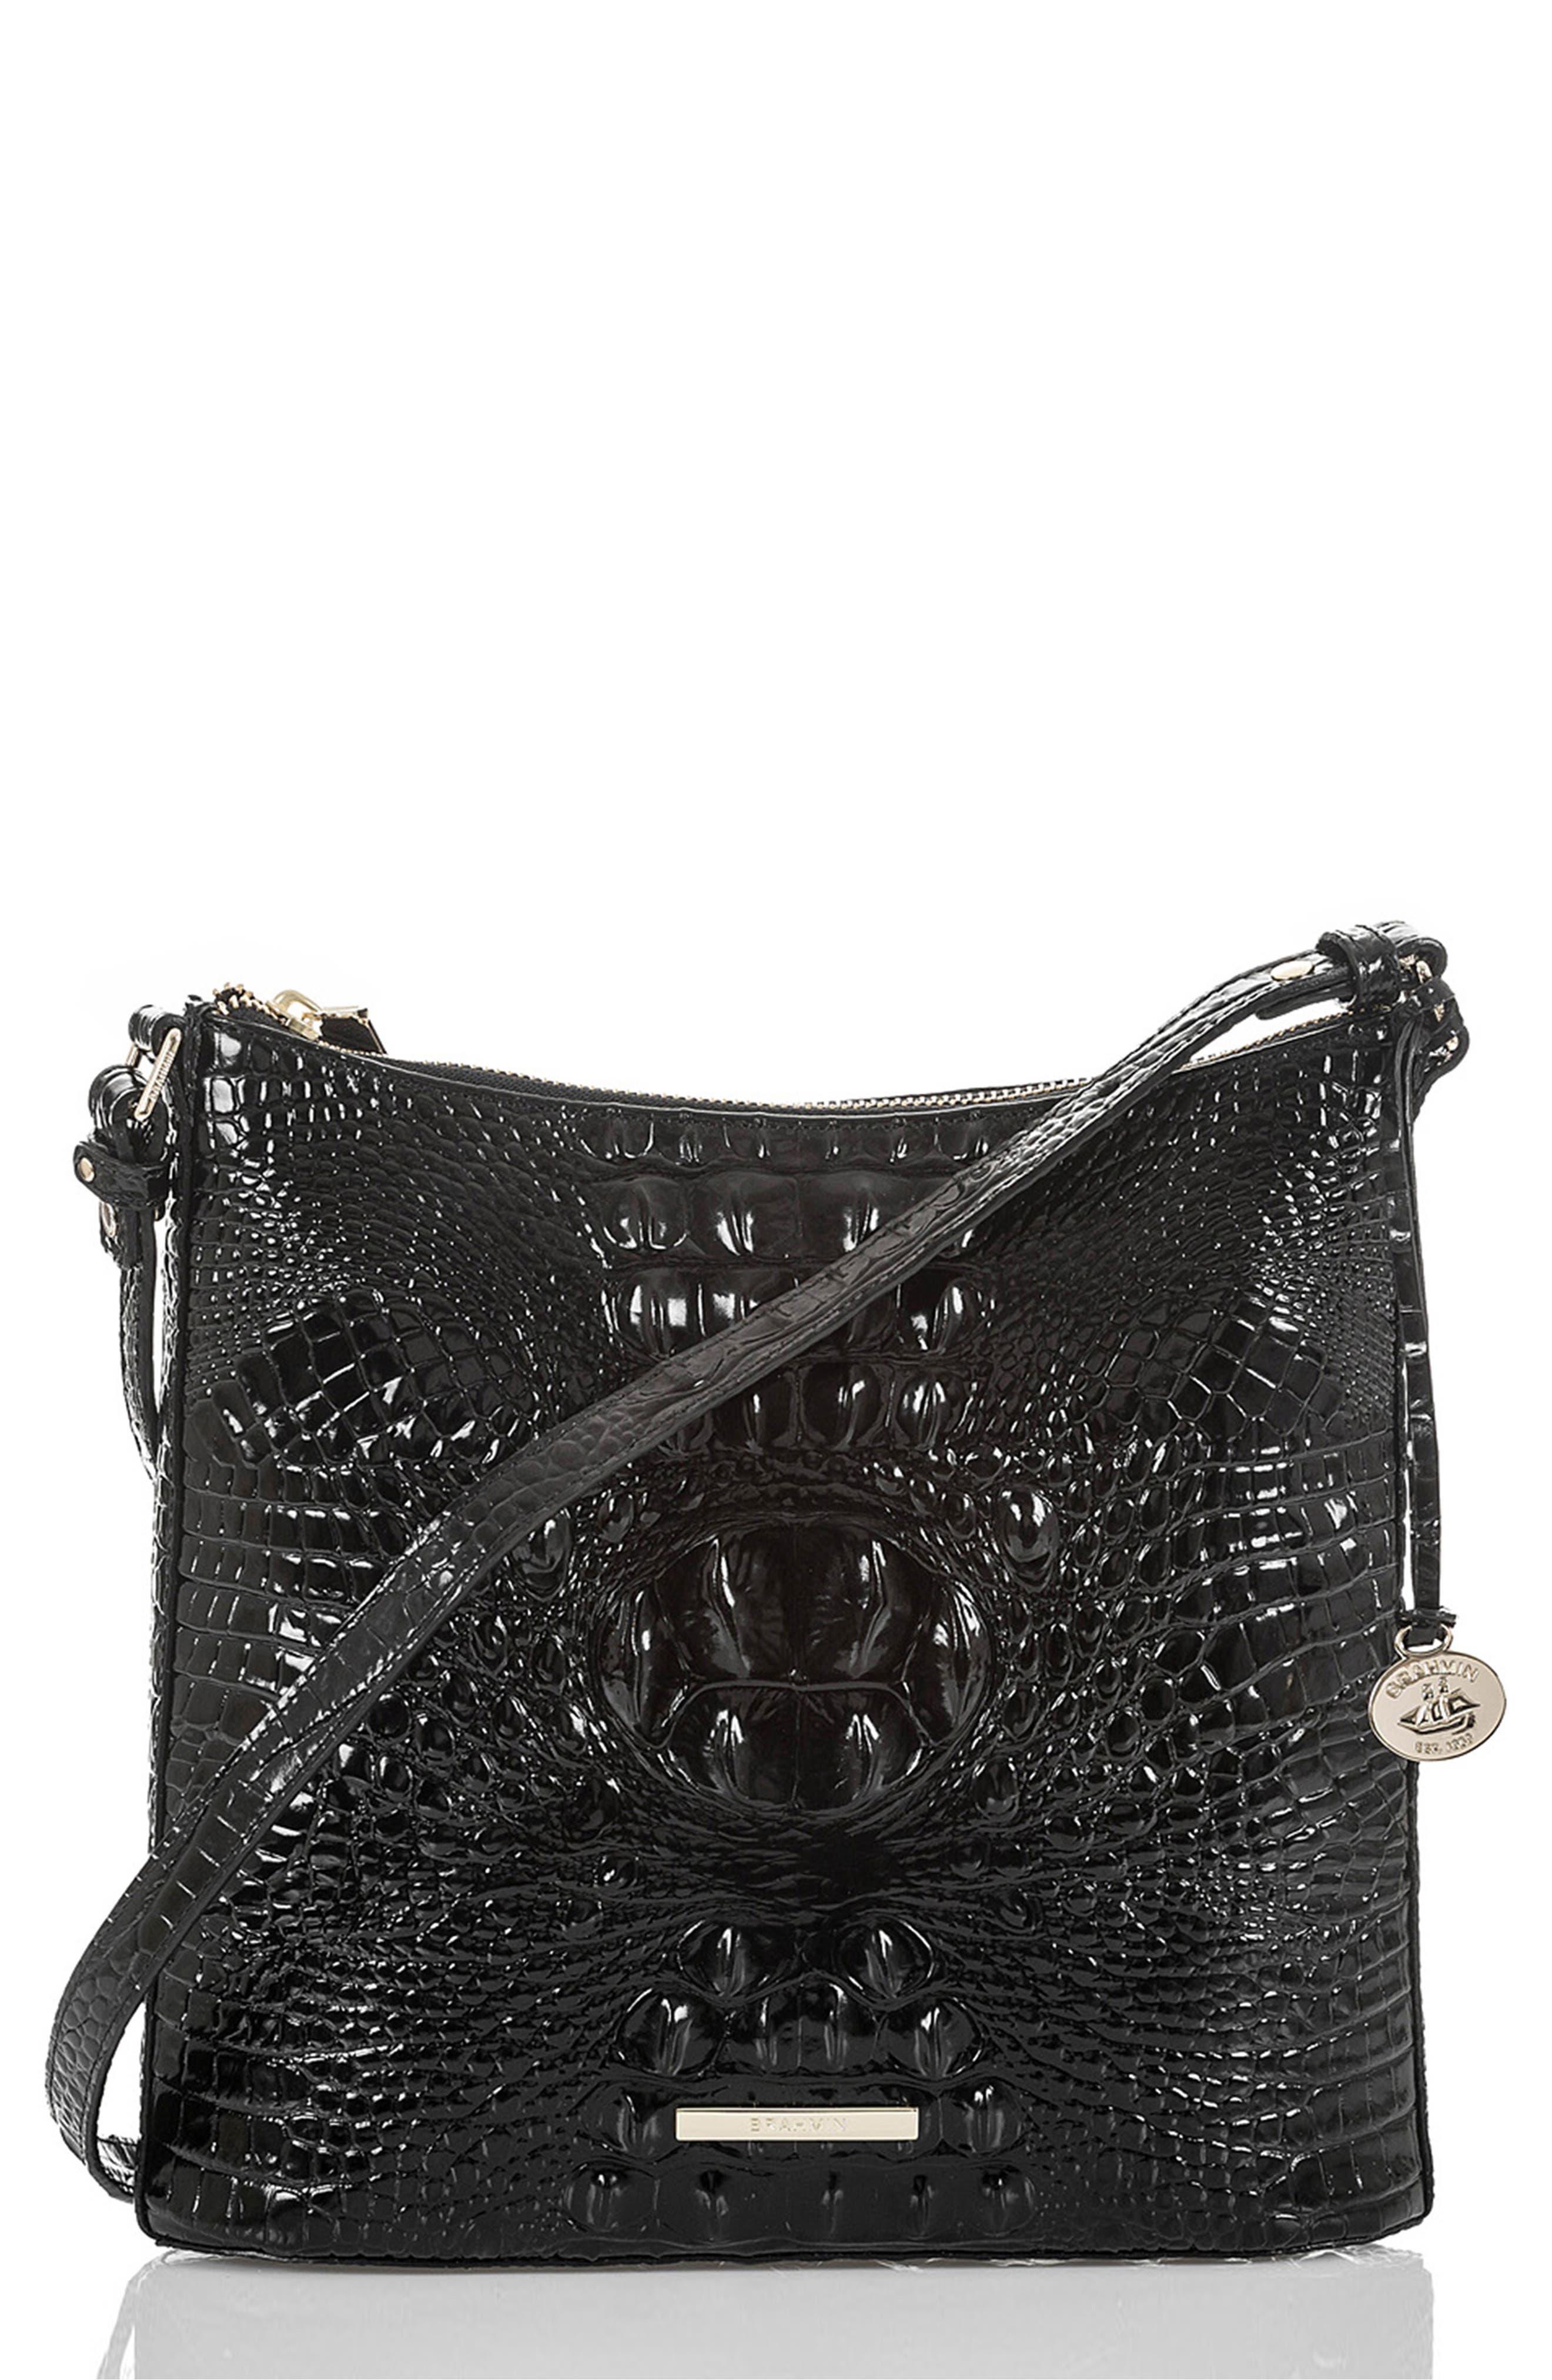 BRAHMIN, Katie Croc Embossed Leather Crossbody Bag, Main thumbnail 1, color, BLACK MEMBOURNE